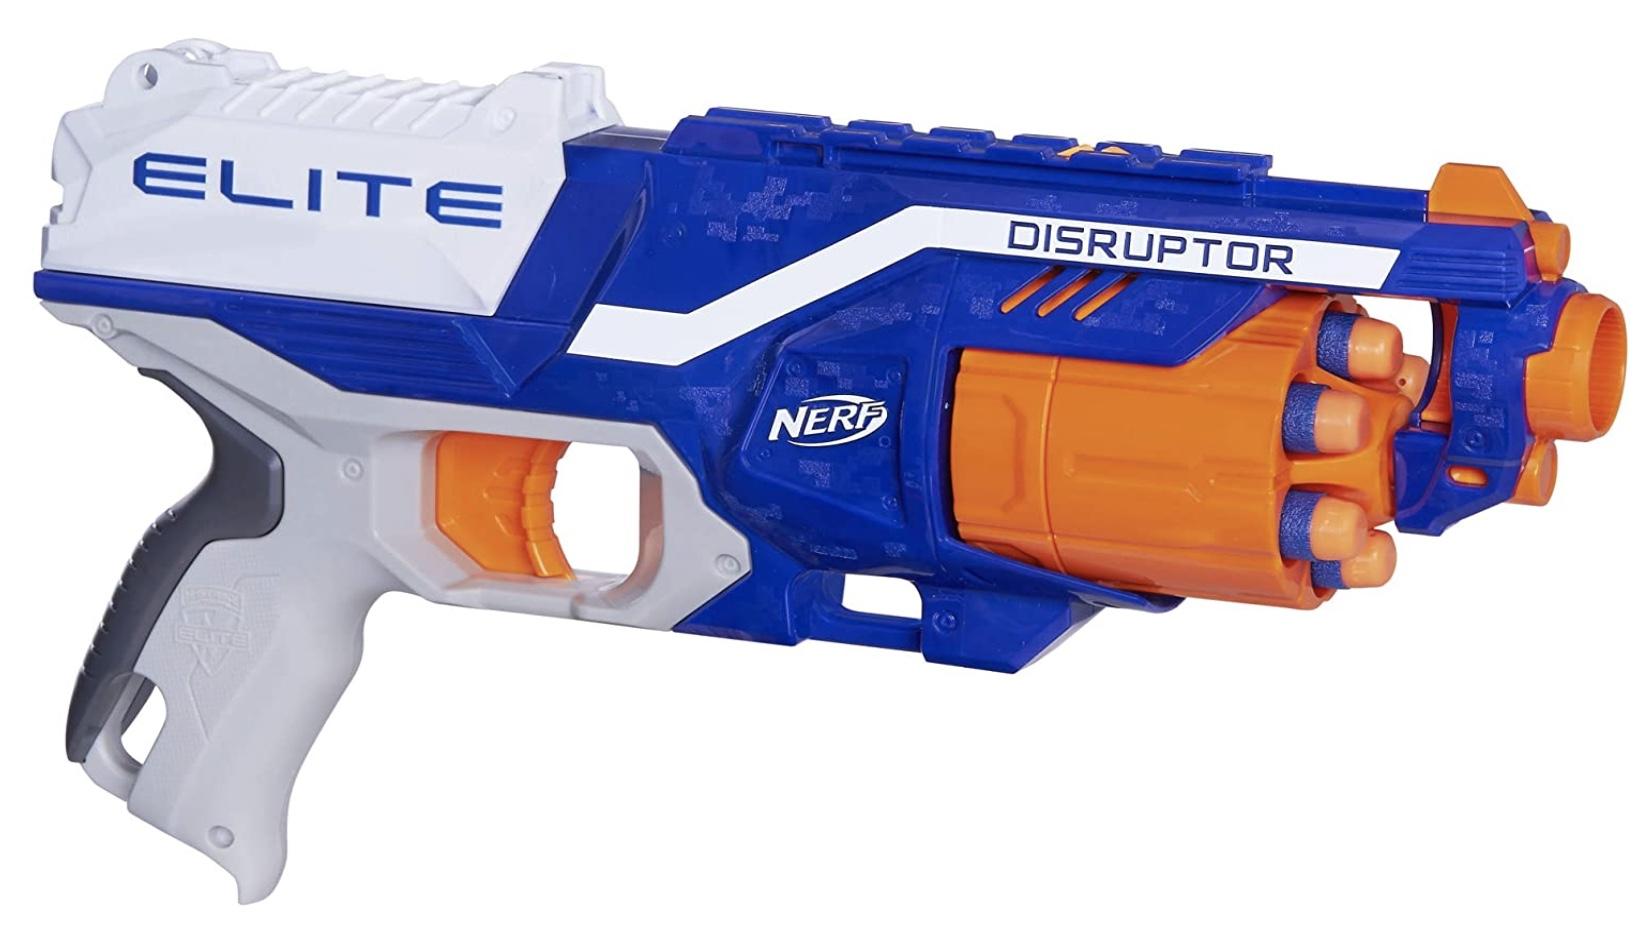 Code promo Amazon : Jeu de tirs NERF Elite Disruptor à 9,99€